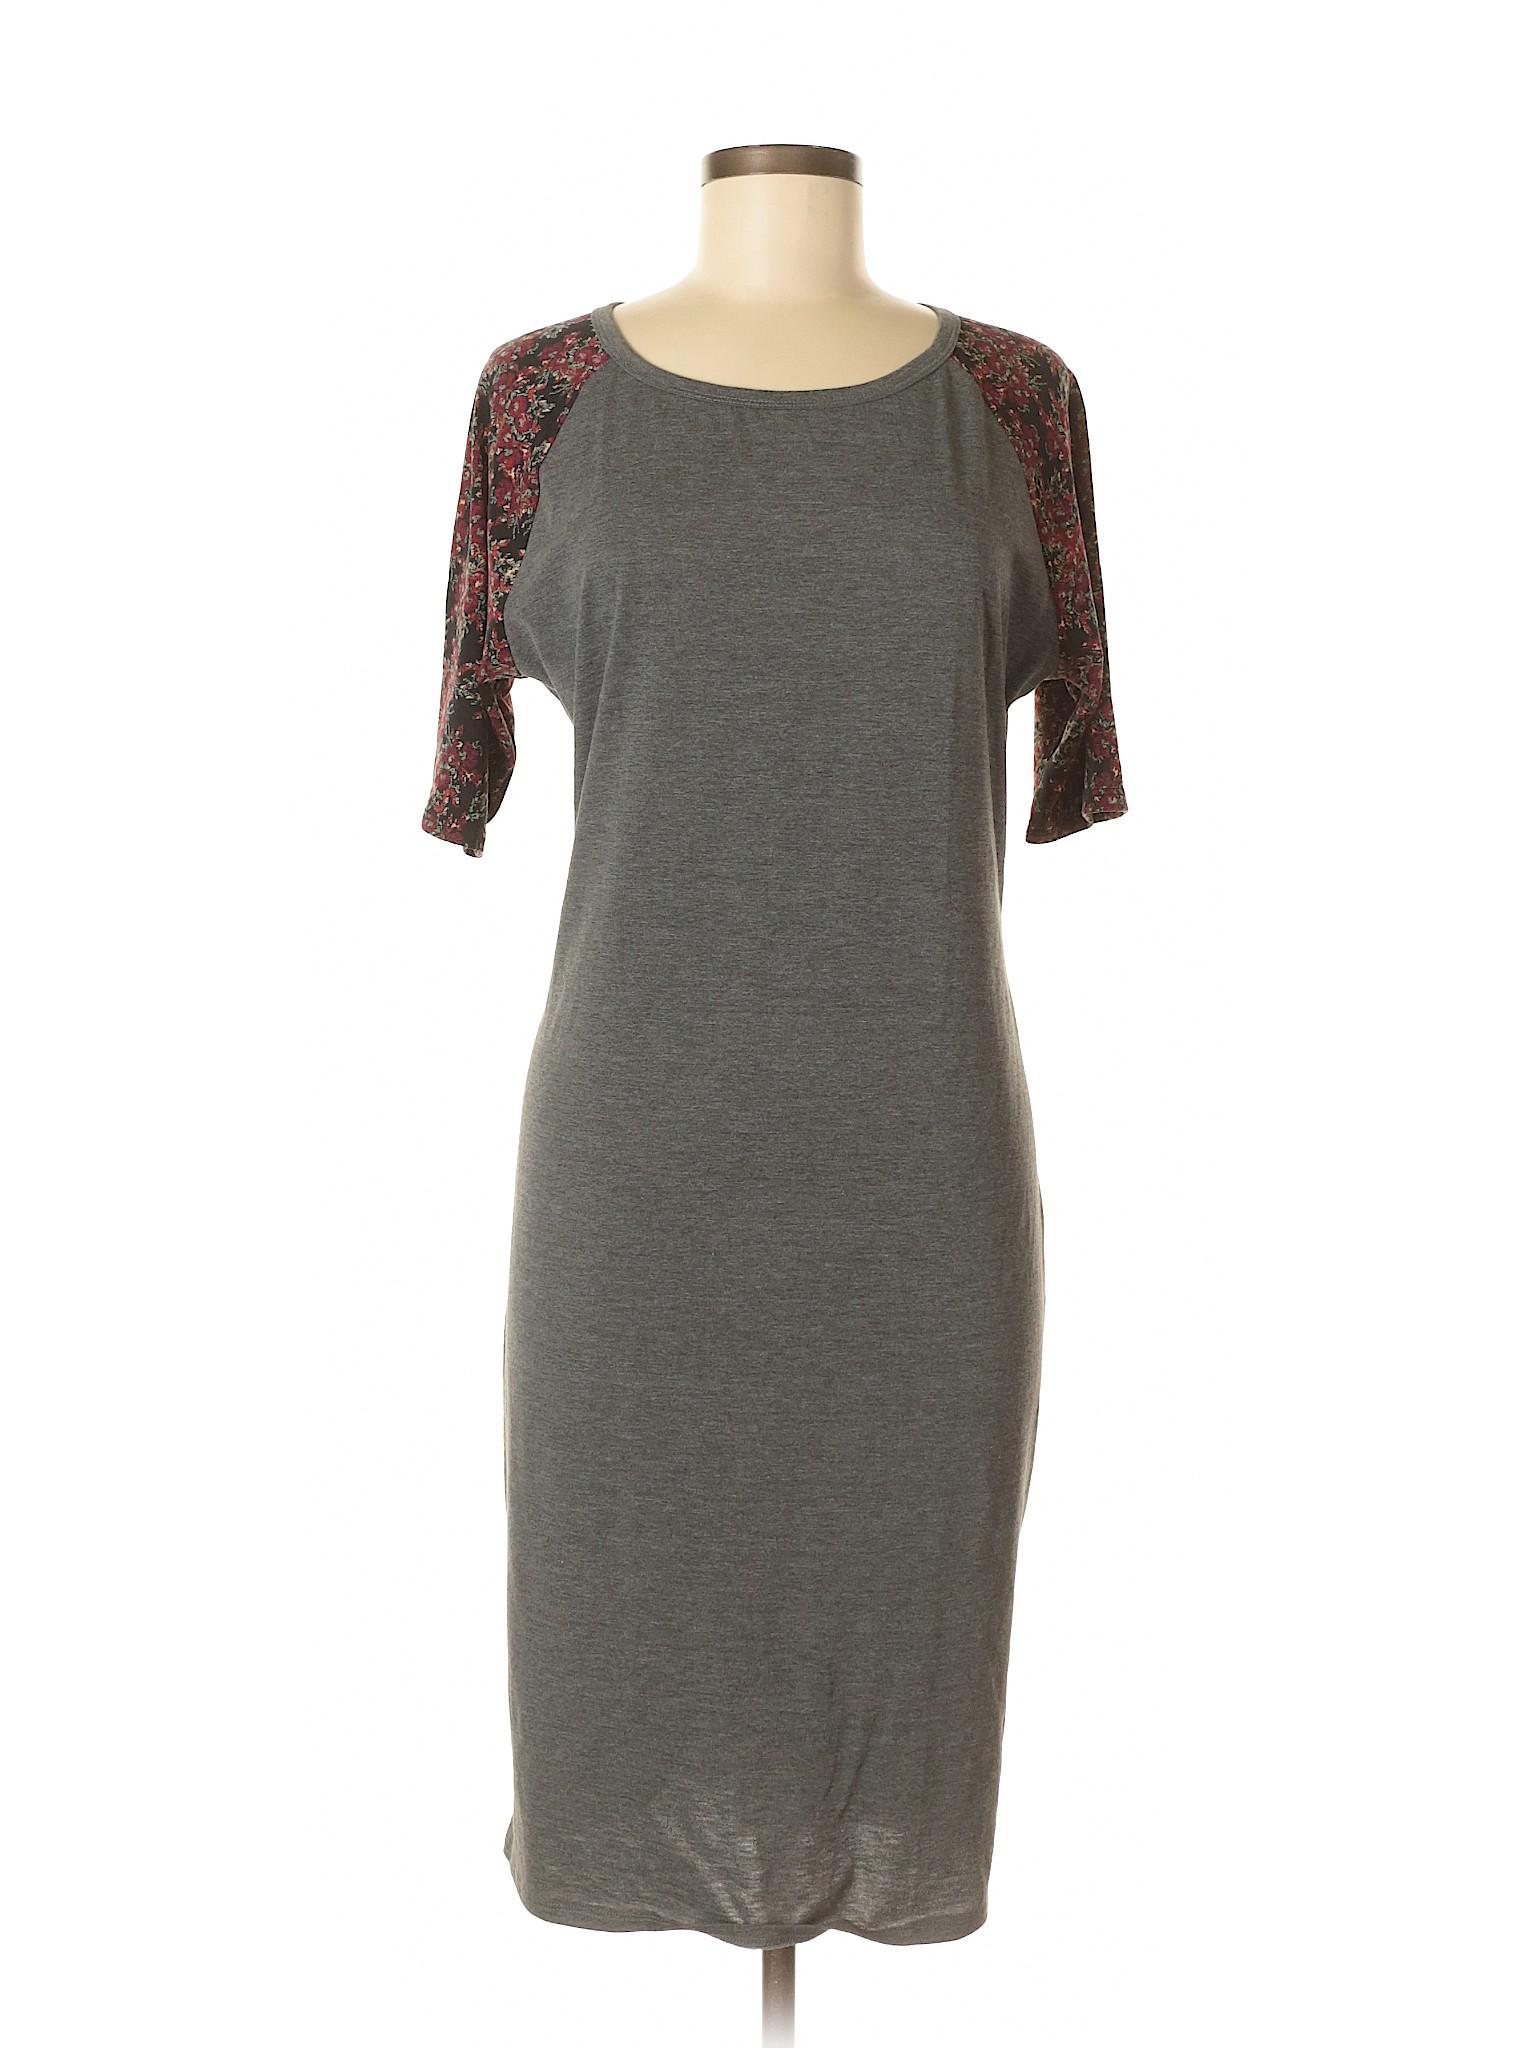 Selling Lularoe Dress Selling Lularoe Casual q5nfxEO7wS